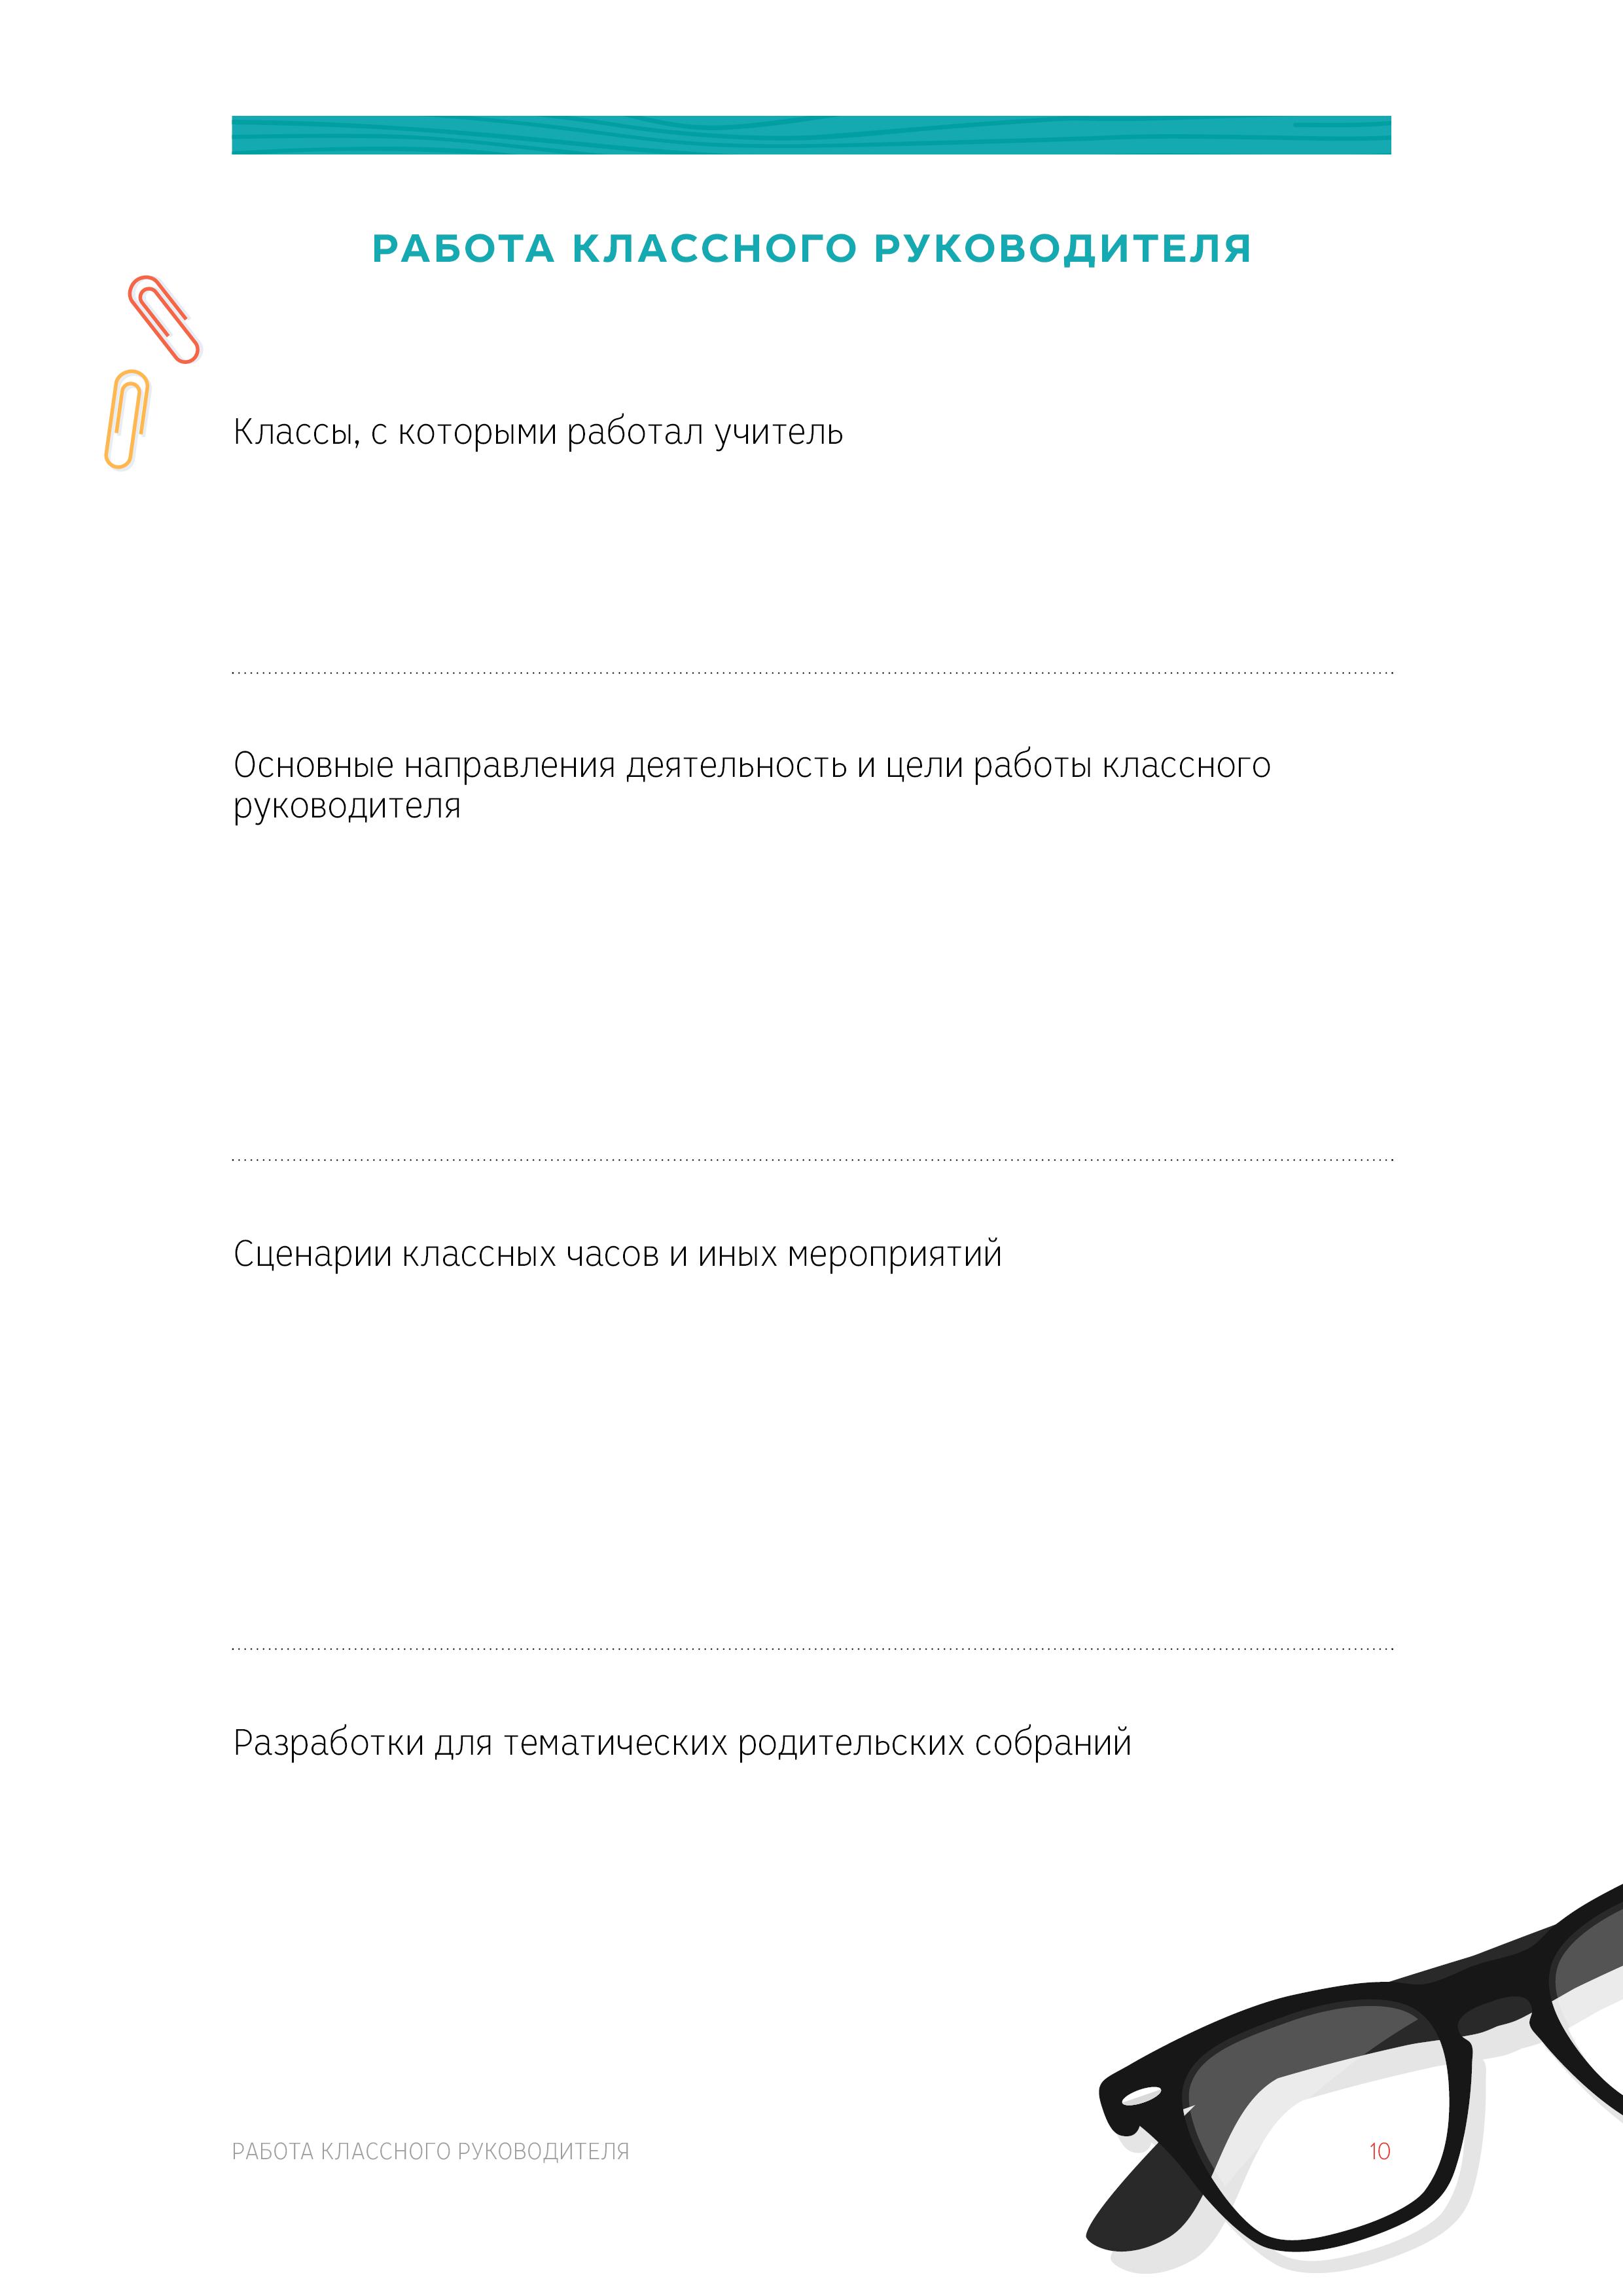 D:\projects\Александр\Олимпиады\Май2015\Портфель учителя\!send\my_portfolio1_39.png